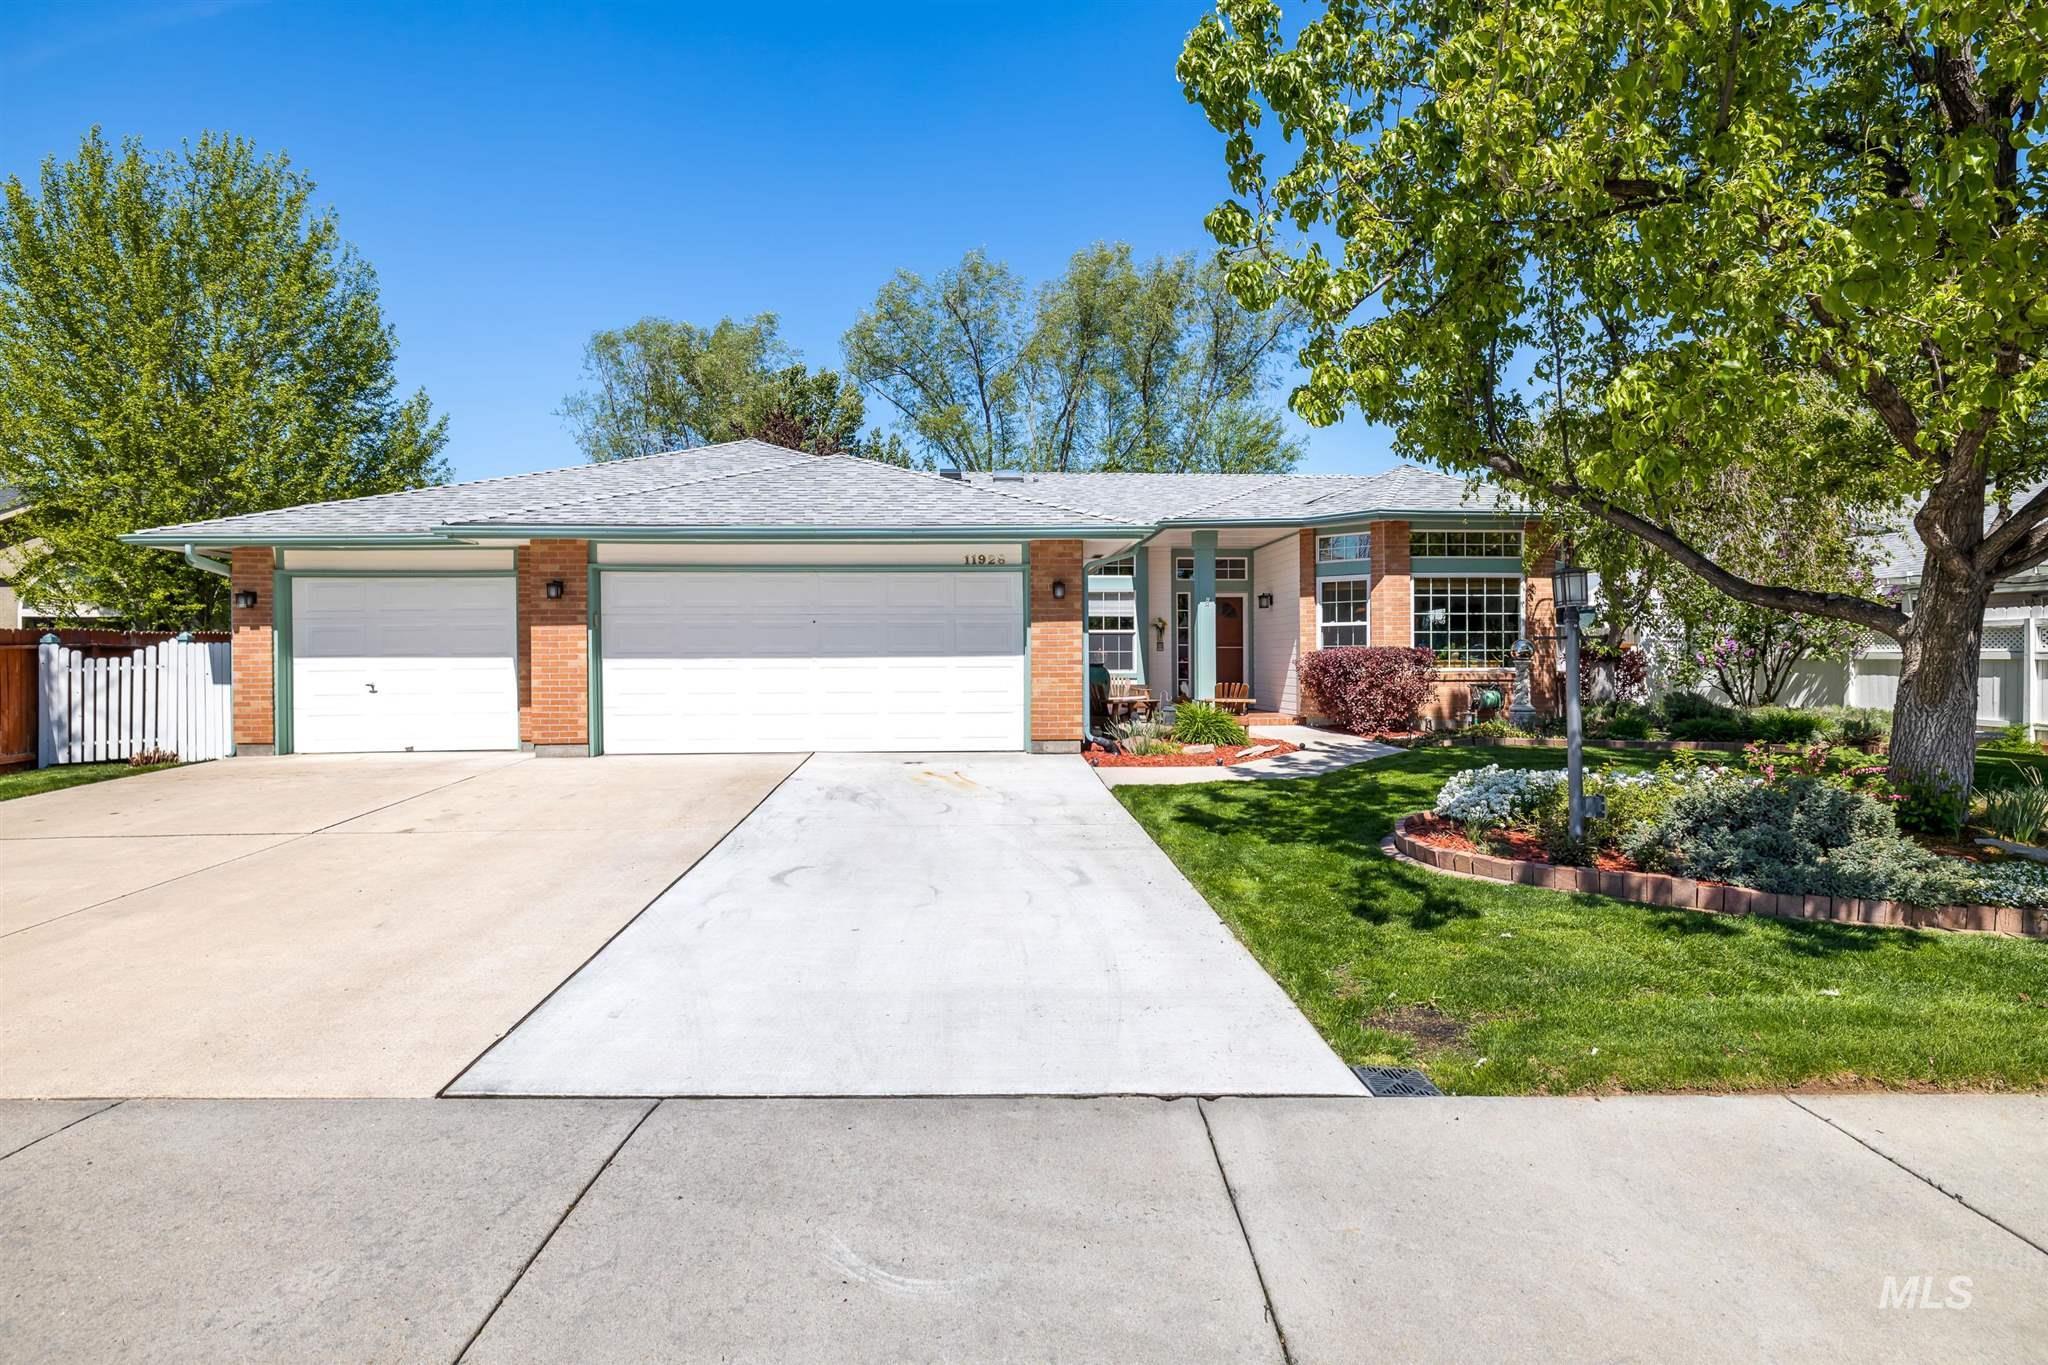 11928 W Stillwater Property Photo - Boise, ID real estate listing